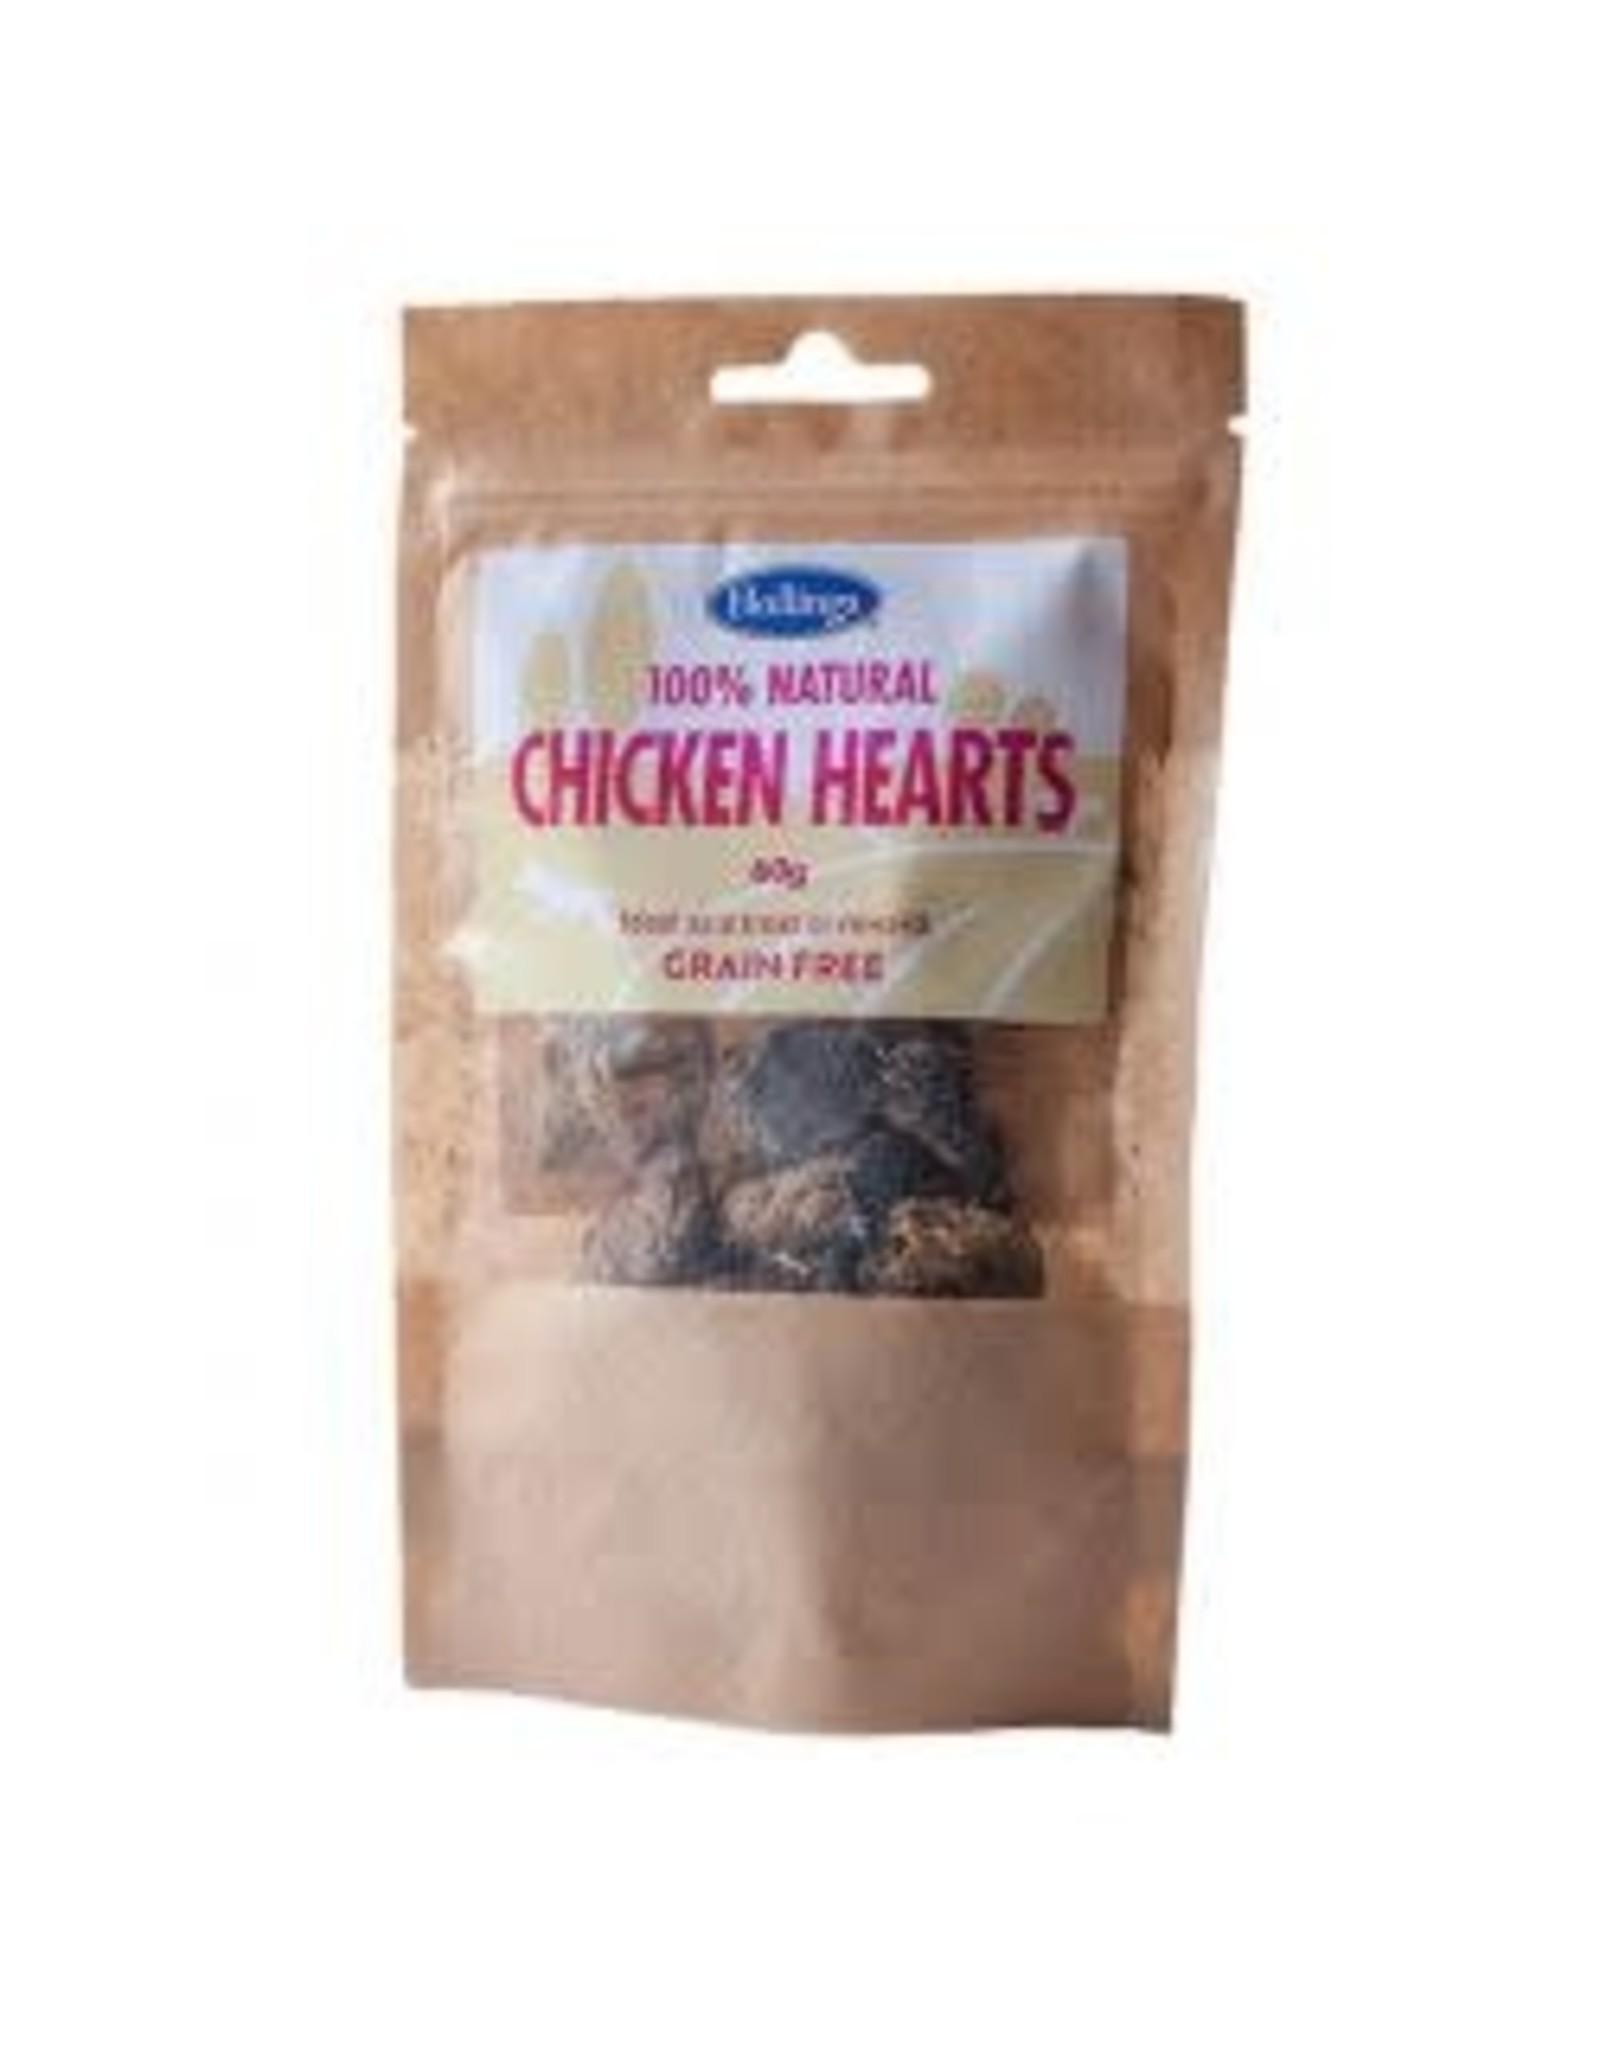 Hollings Hollings Chicken Hearts 60g